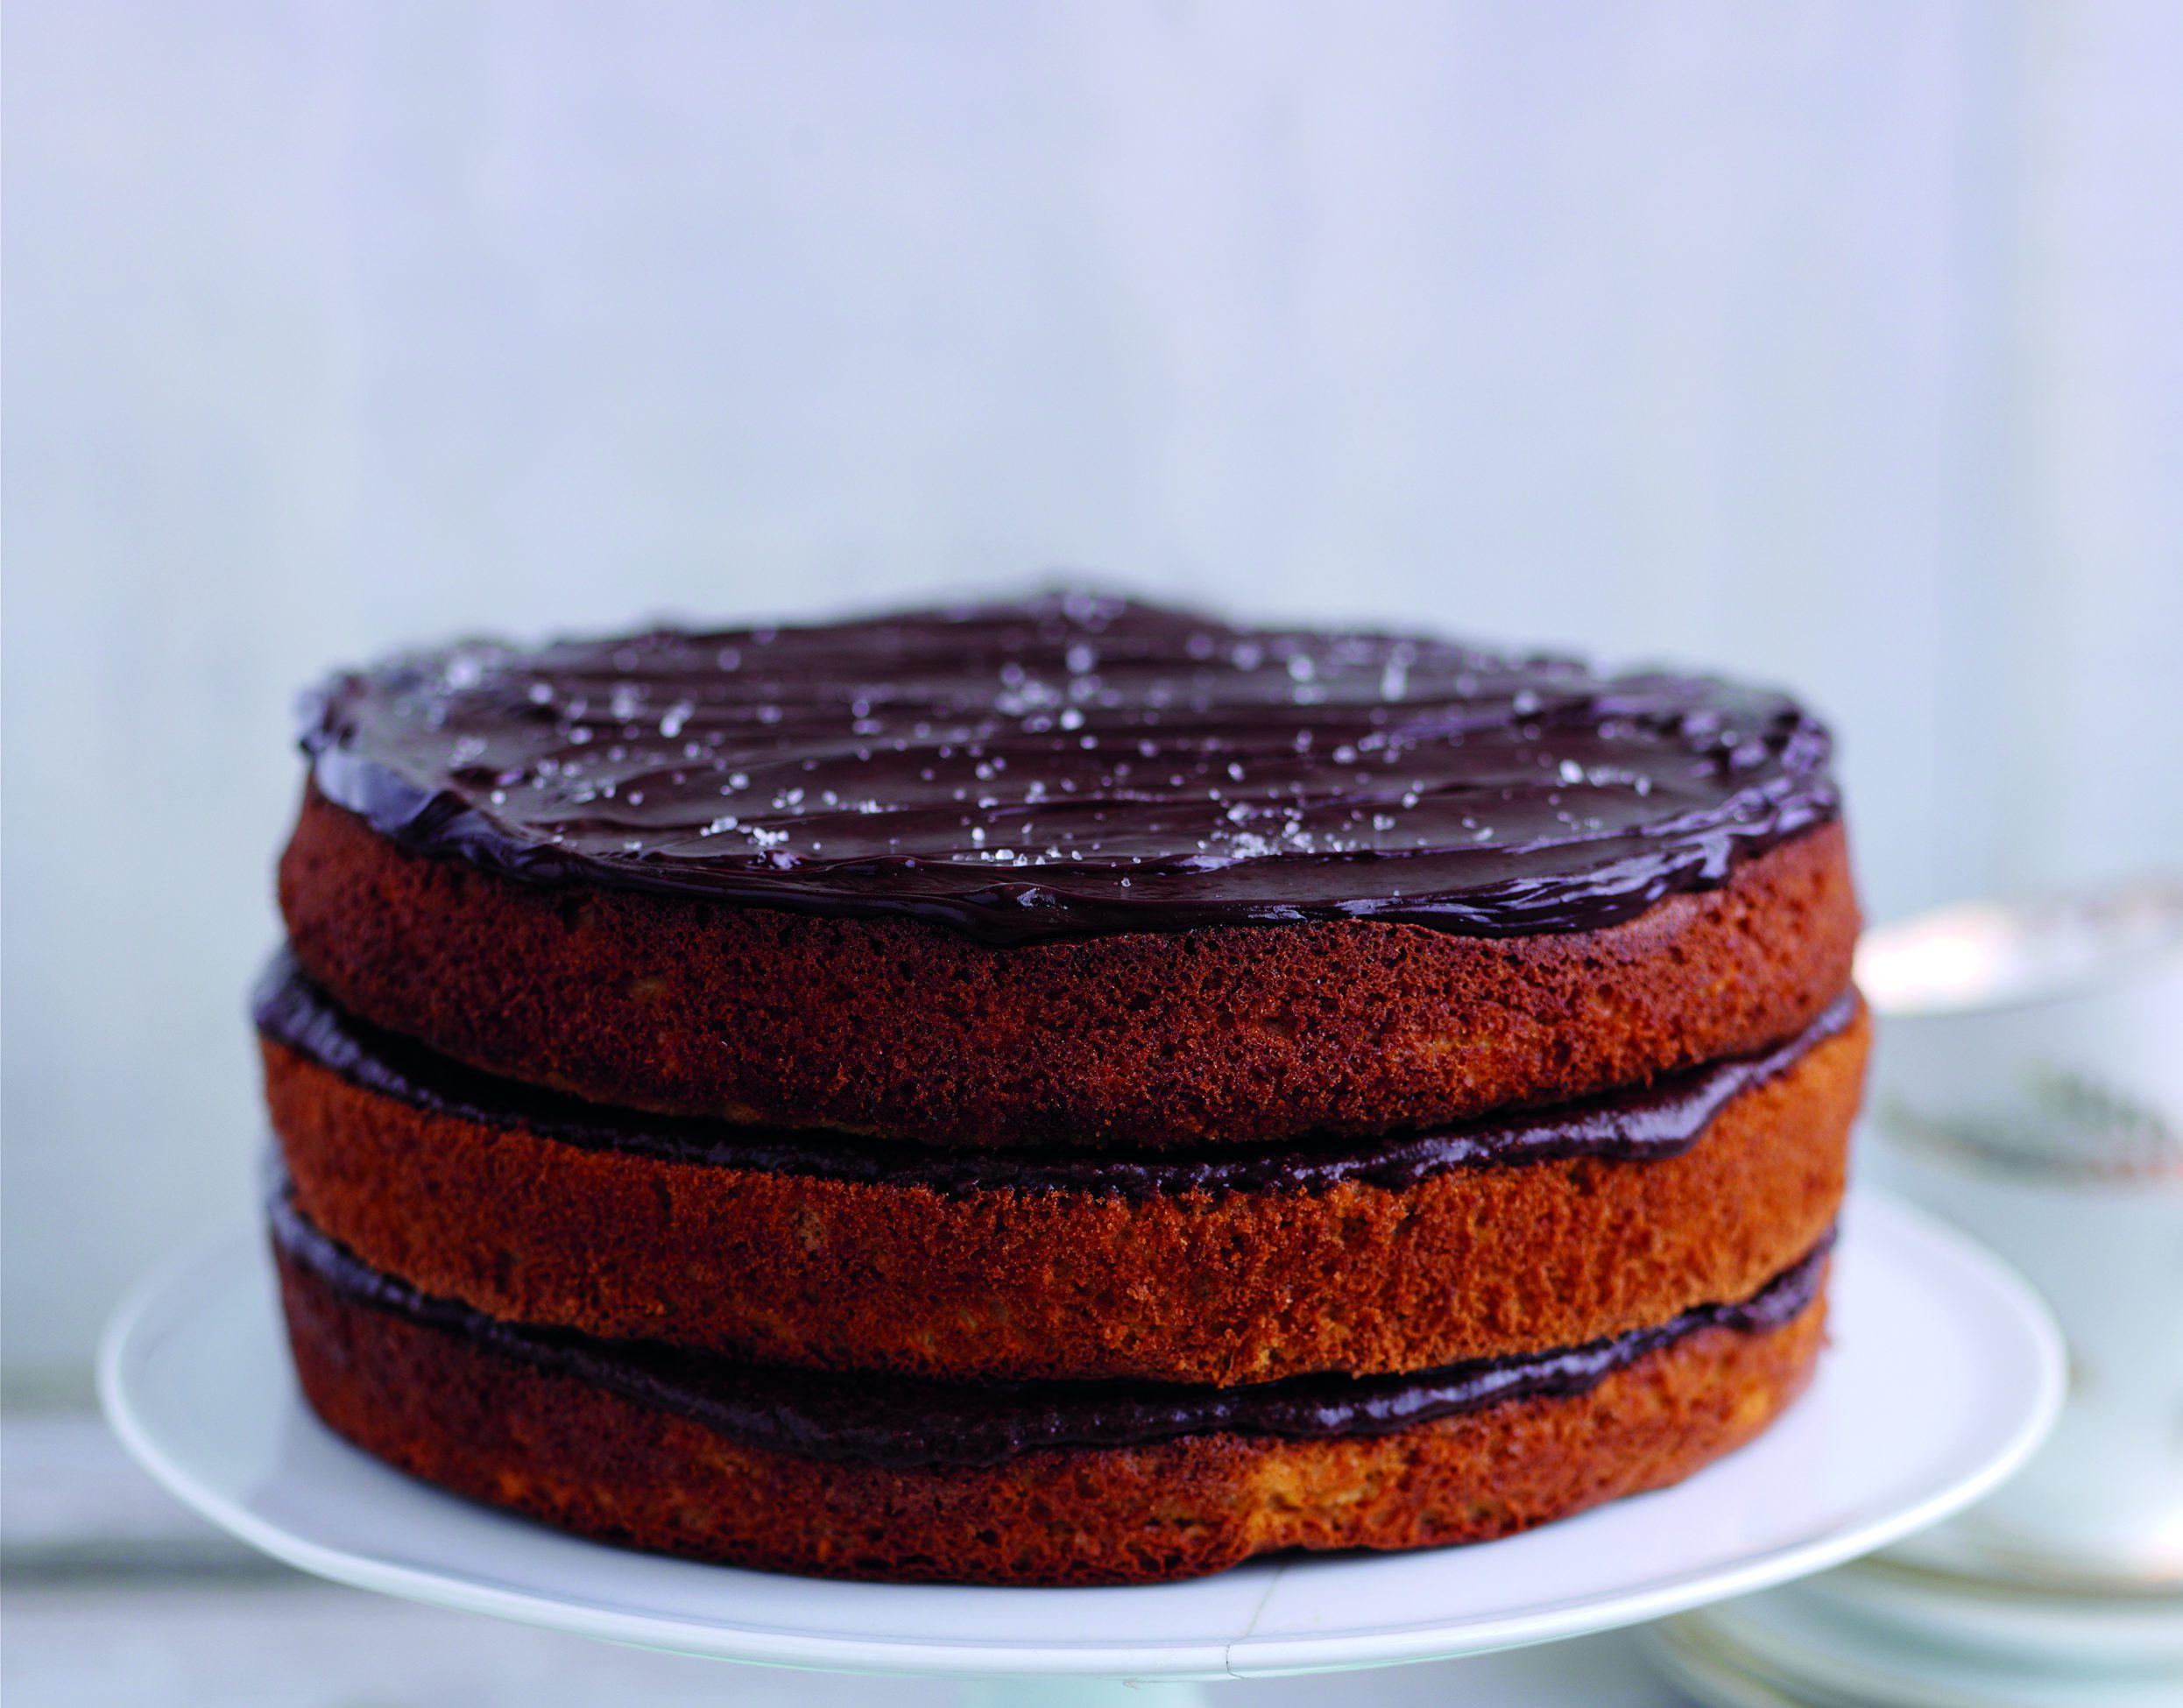 olive-oil-chocolate-orange-cake-1